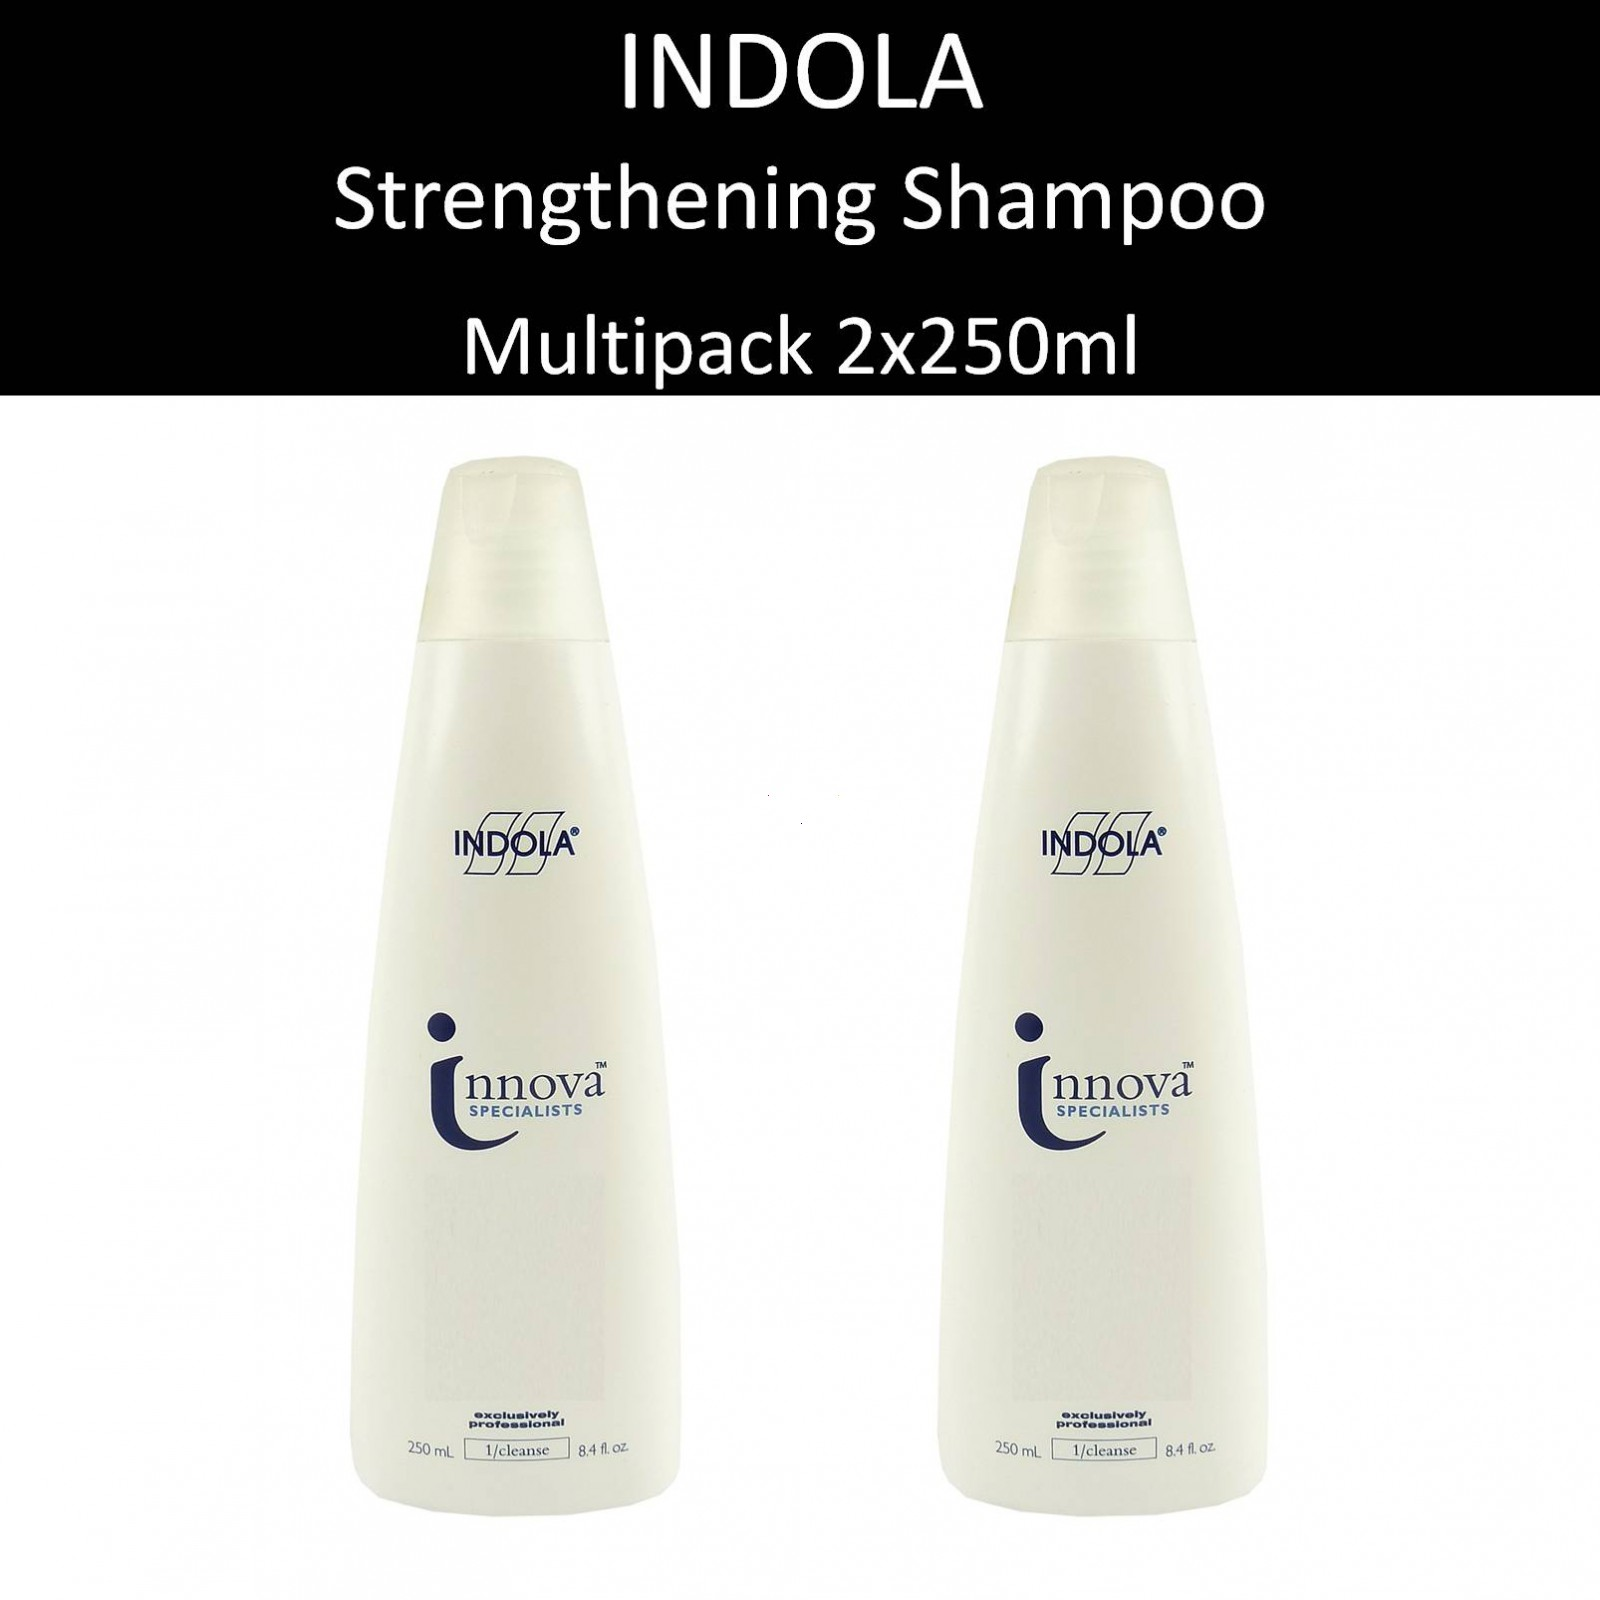 Indola - Innova Strengthening Shampoo kräftigend Haar Pflege Multipack 2x250ml